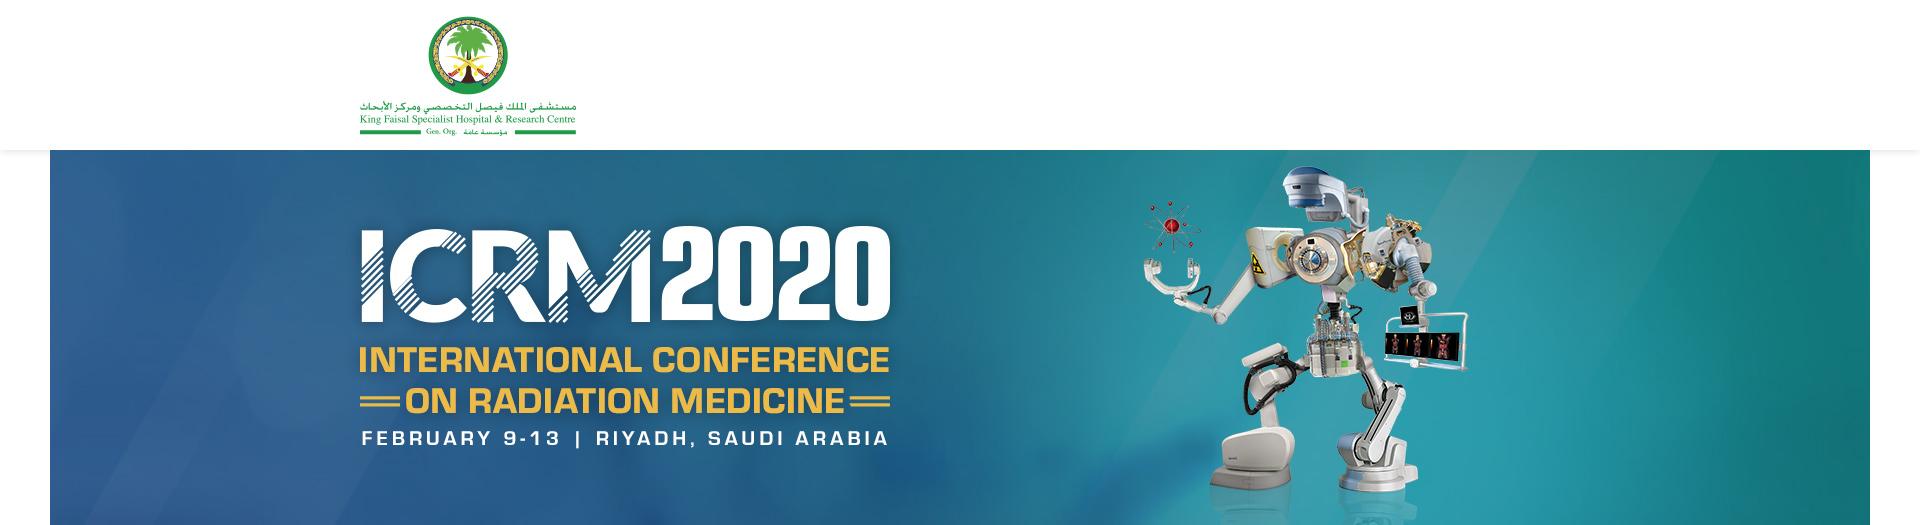 6th International Conference on Radiation Medicine